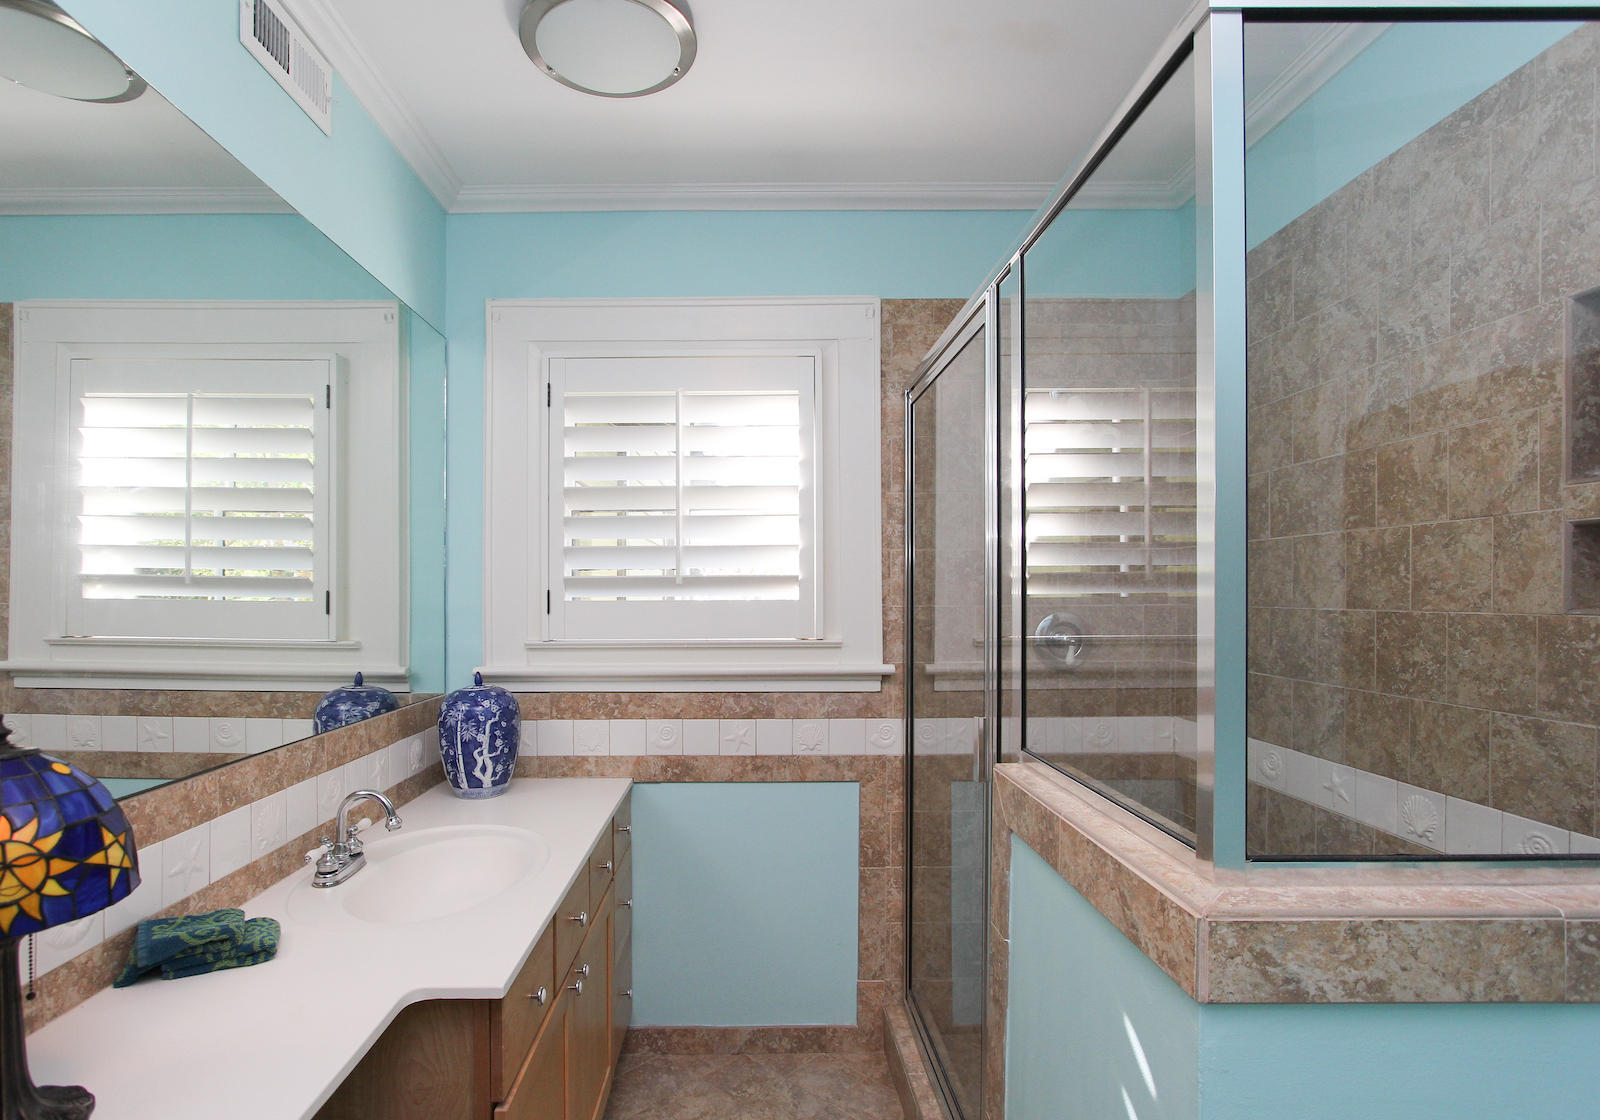 Albemarle Point Homes For Sale - 3 Albemarle, Charleston, SC - 20